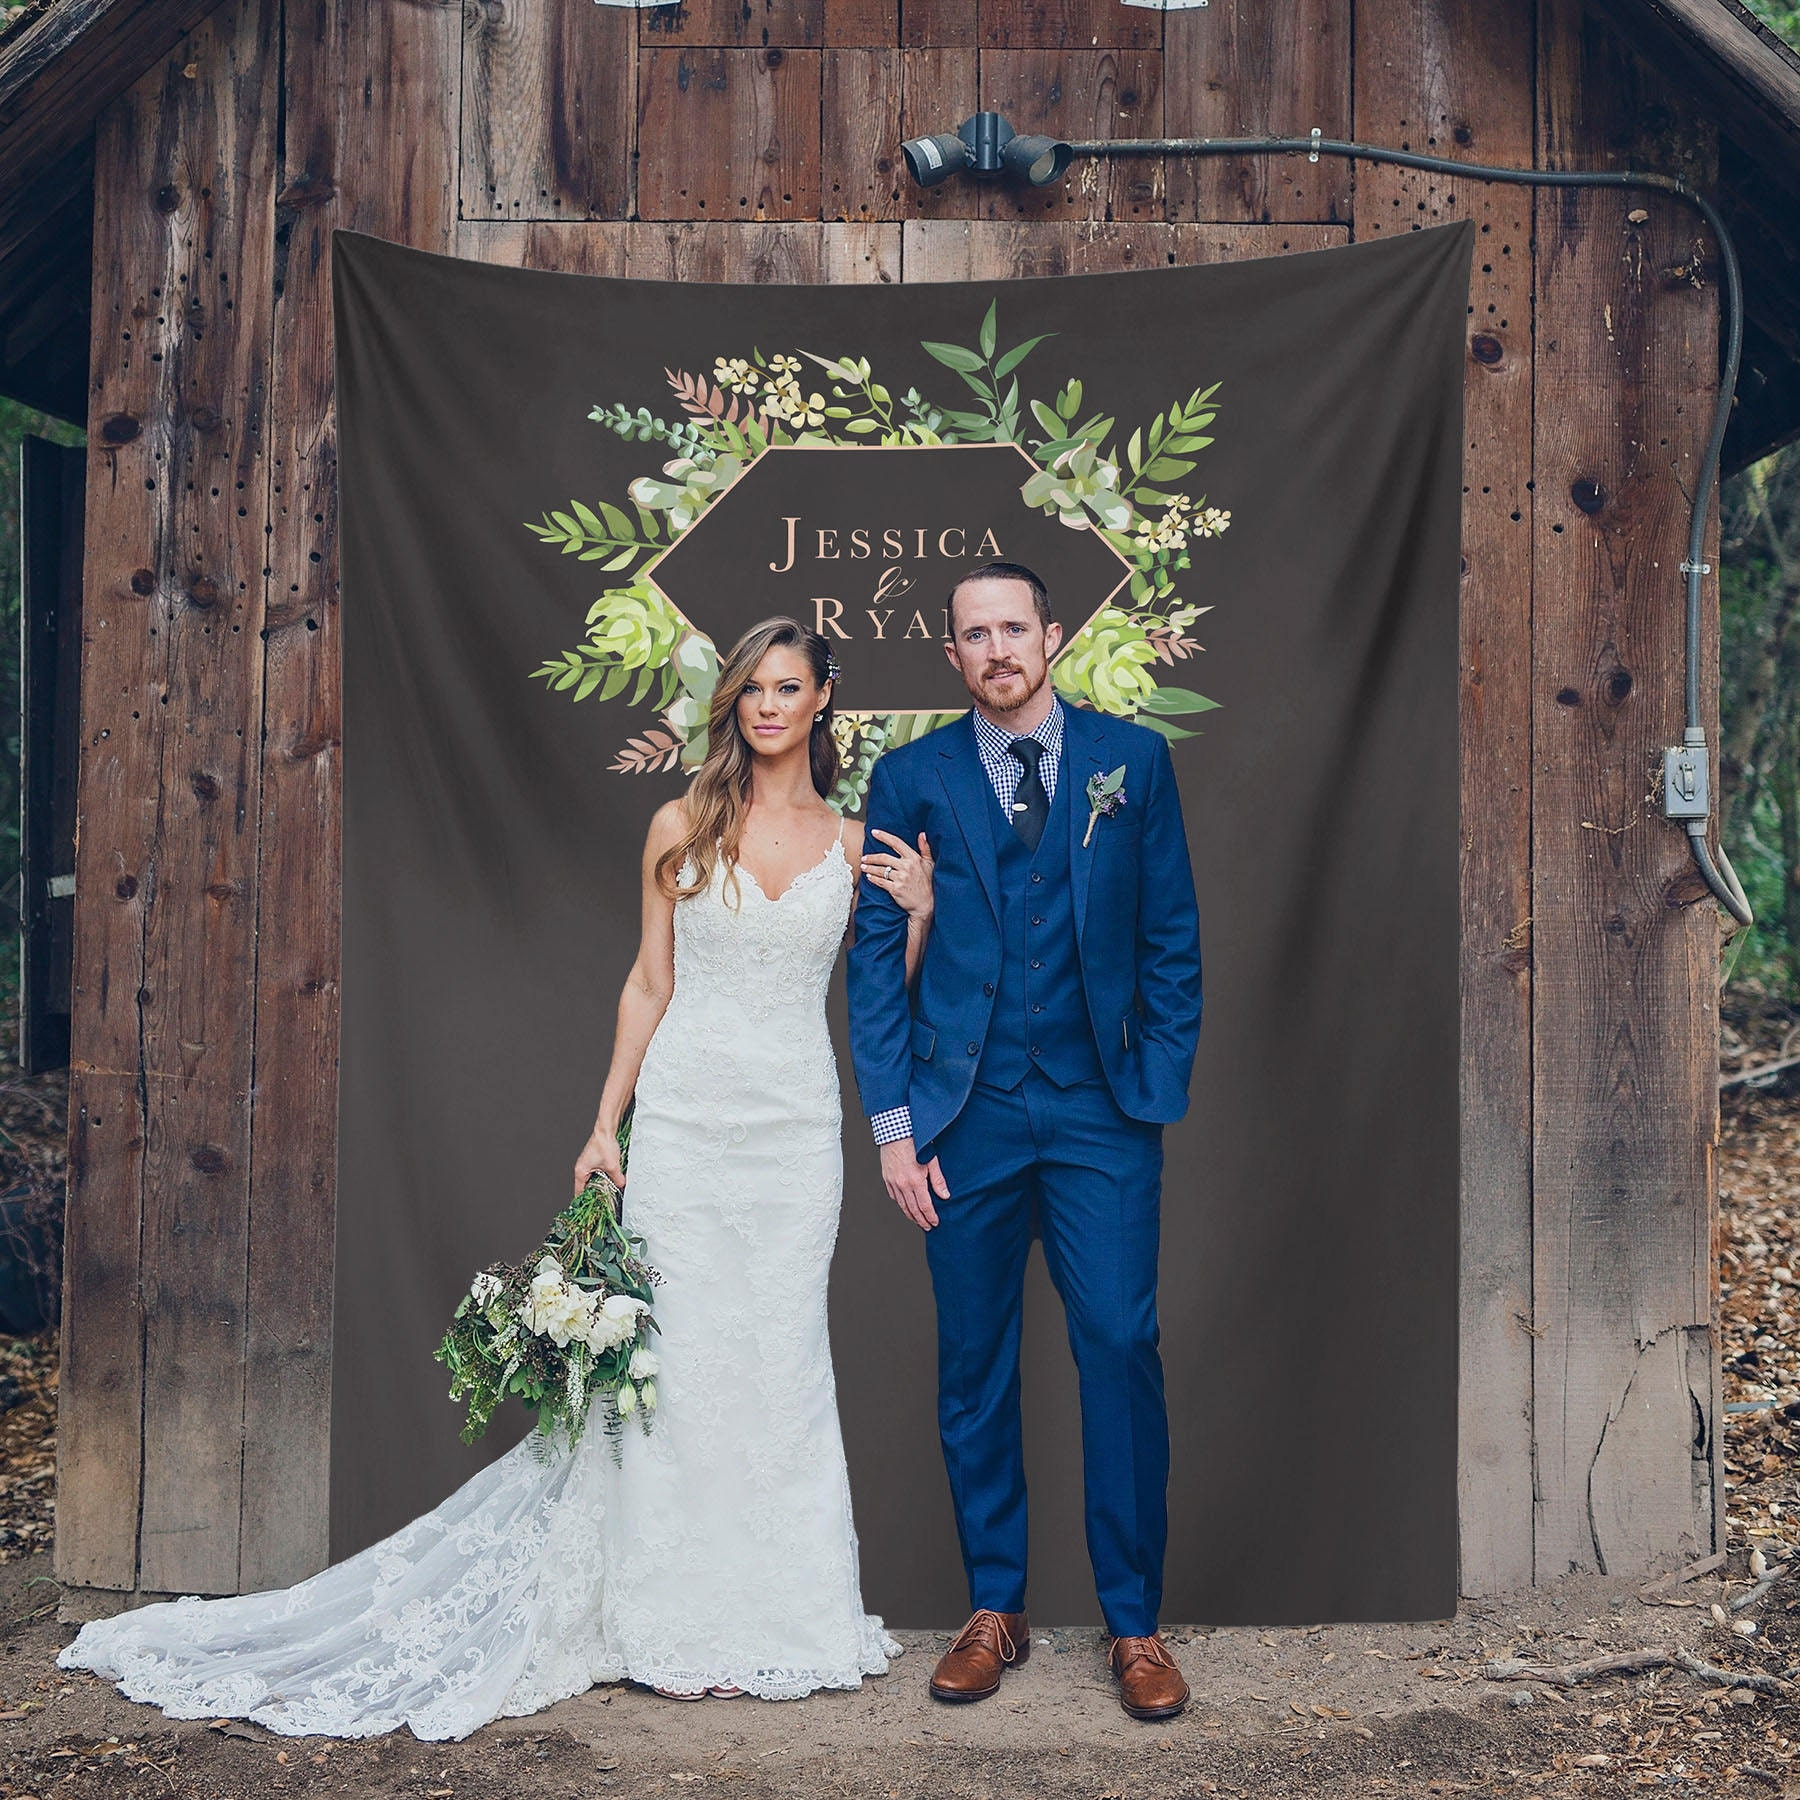 Succulent Wedding Backdrop Succulent Wedding Decor Photo